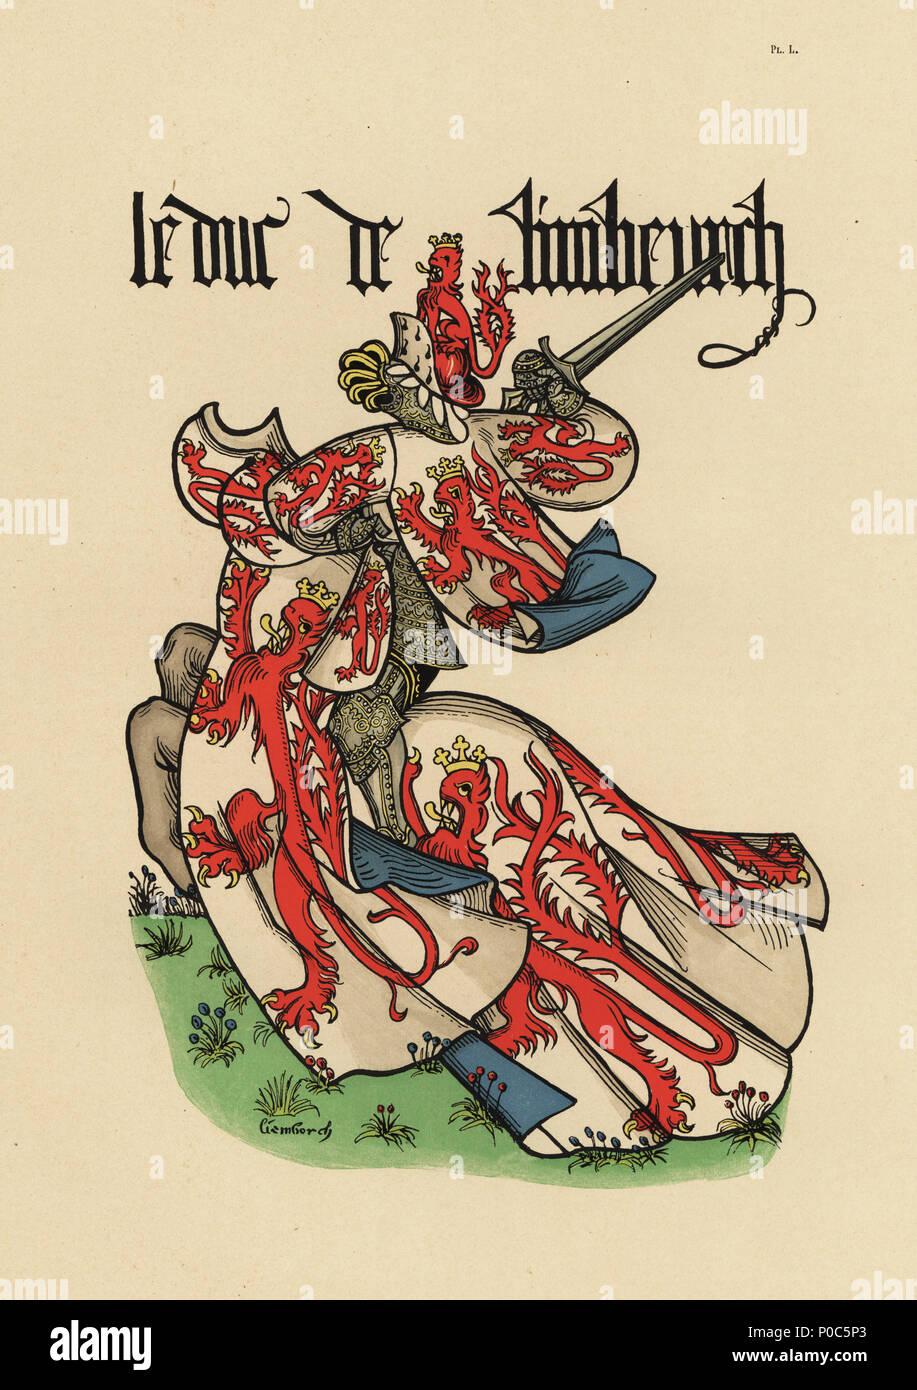 Duke of Limburg, Duc de Limbourg. Chromolithograph from Loredan Larchey's Ancien Armorial Equestre de la Toison d'Or et de l'Europe au 15e siecle (Ancient Equestrian Armorials of the Order of the Golden Fleece and Europe in the 15th century), Paris, 1890. From illustrated manuscript 4790 in the Bibliotheque de l'Arsenal. - Stock Image